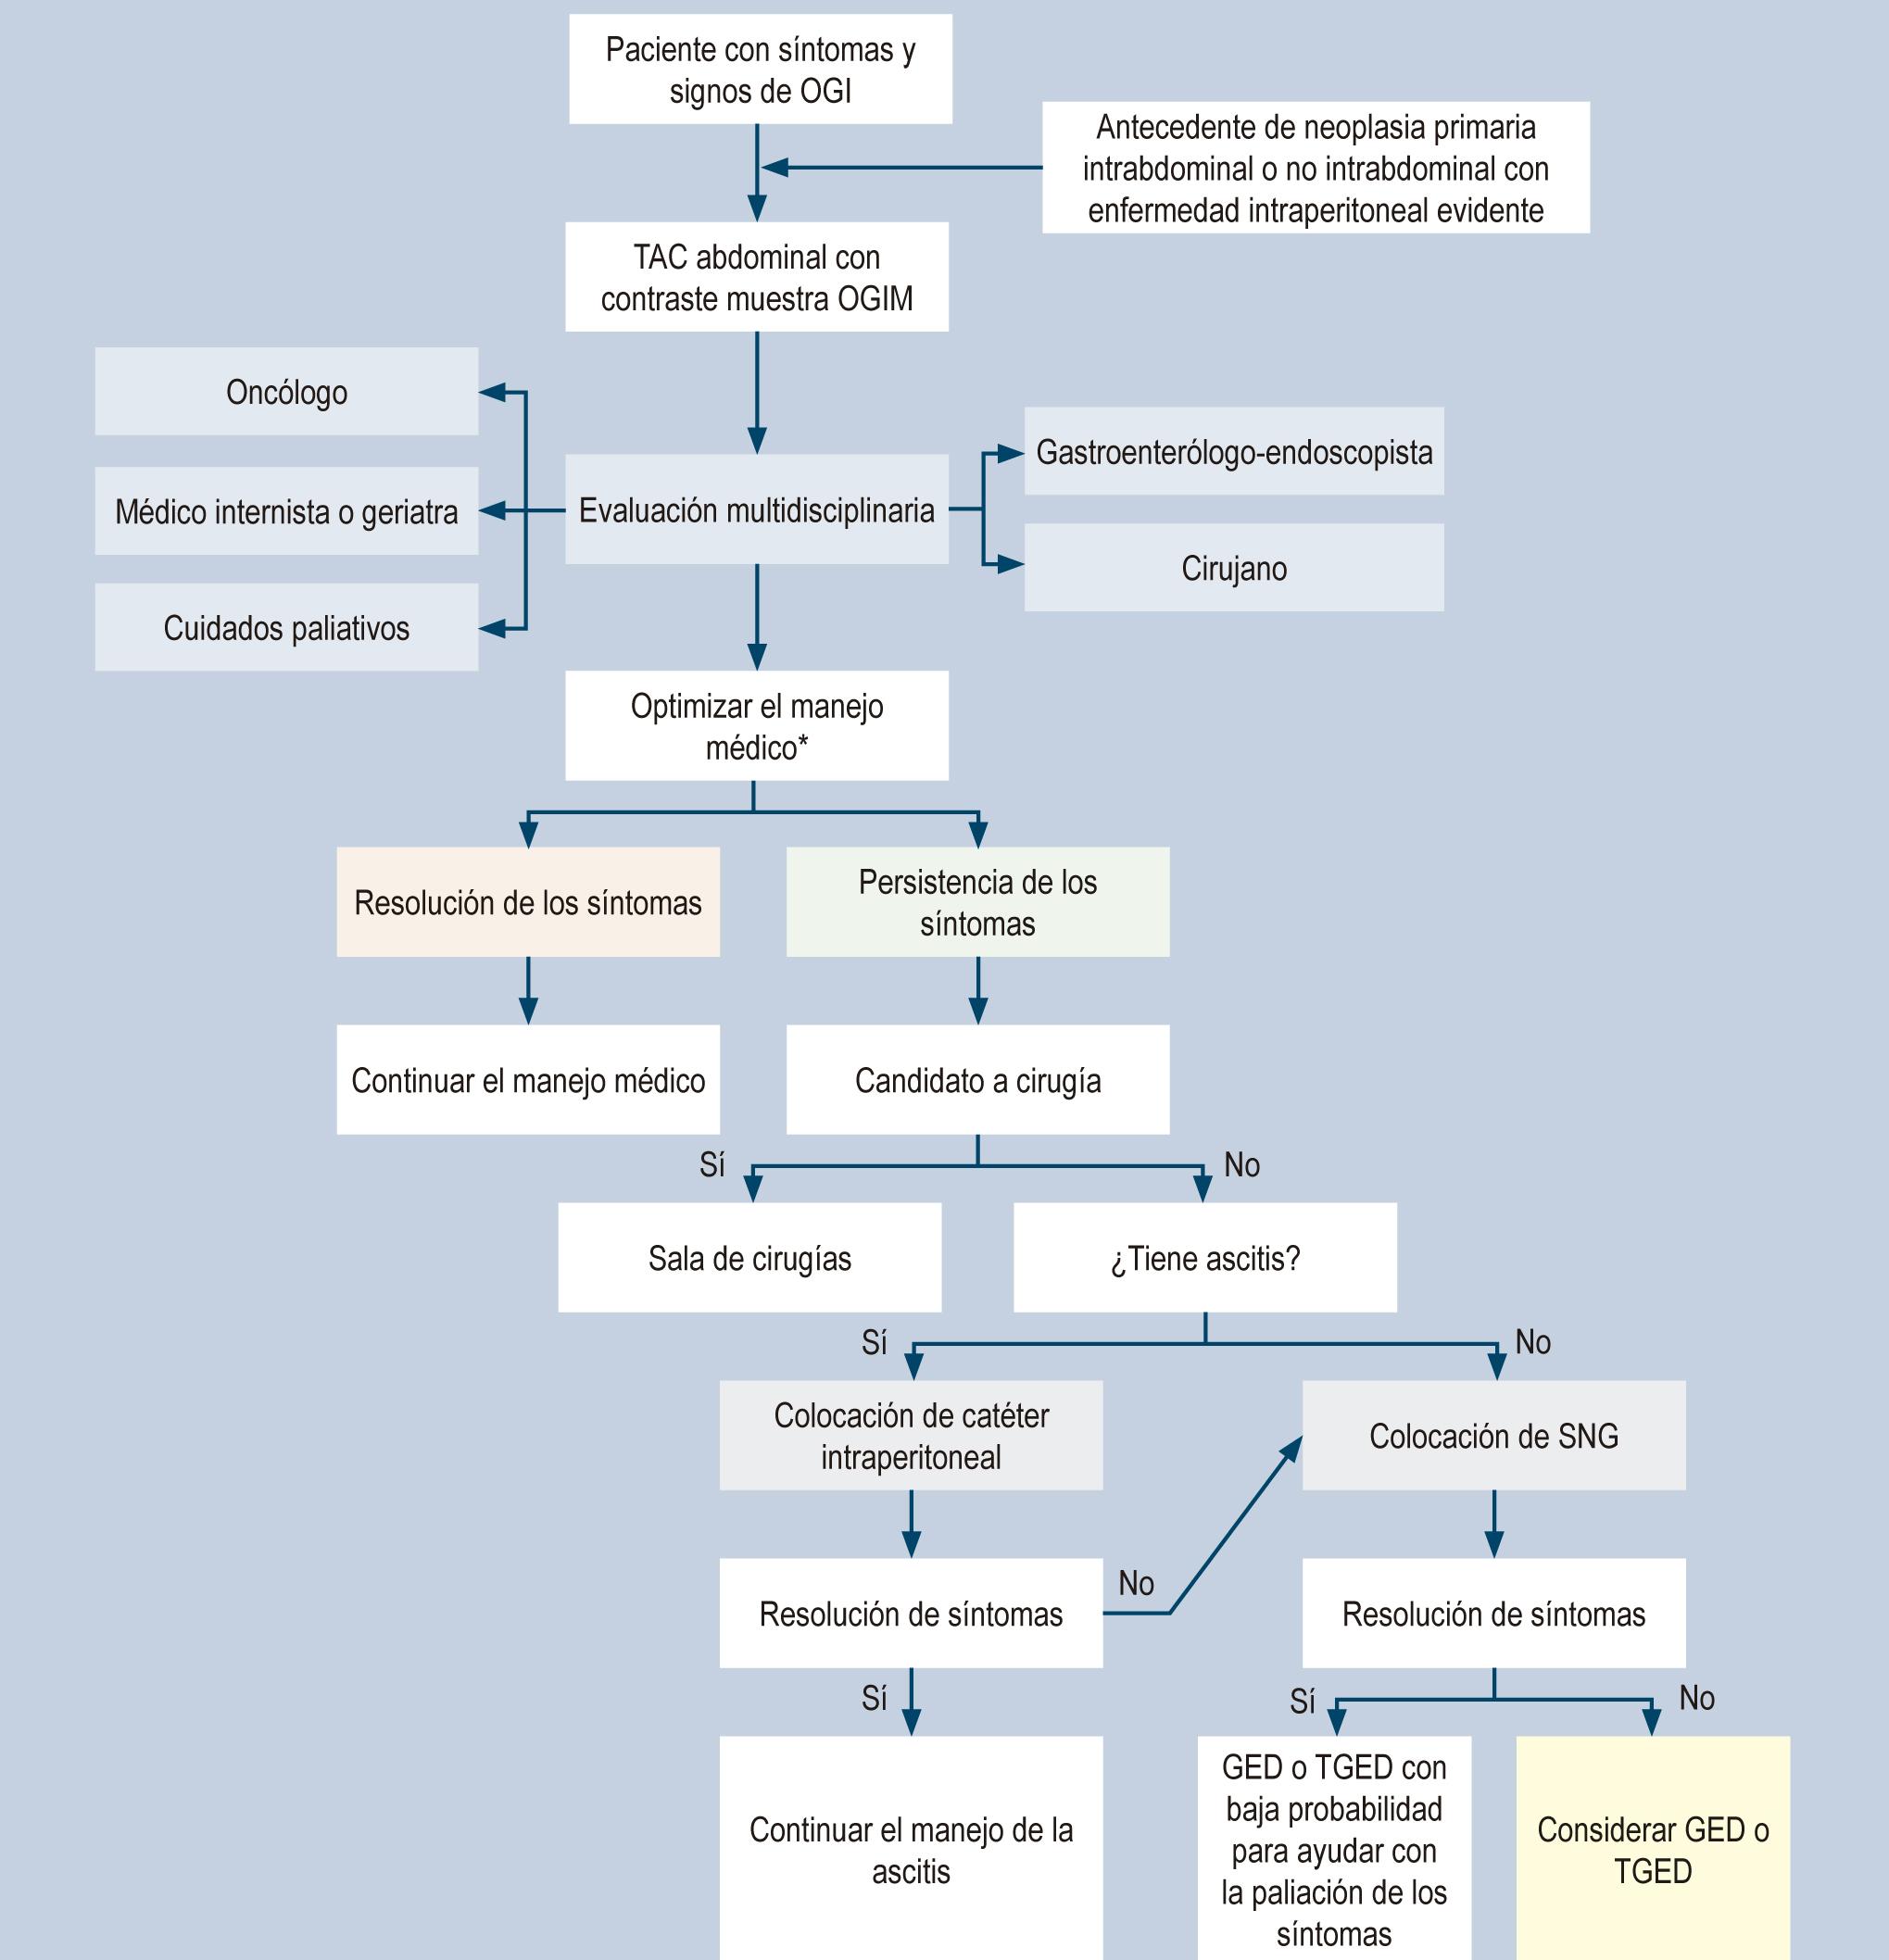 Figura 1. Algoritmo de manejo de OGIM